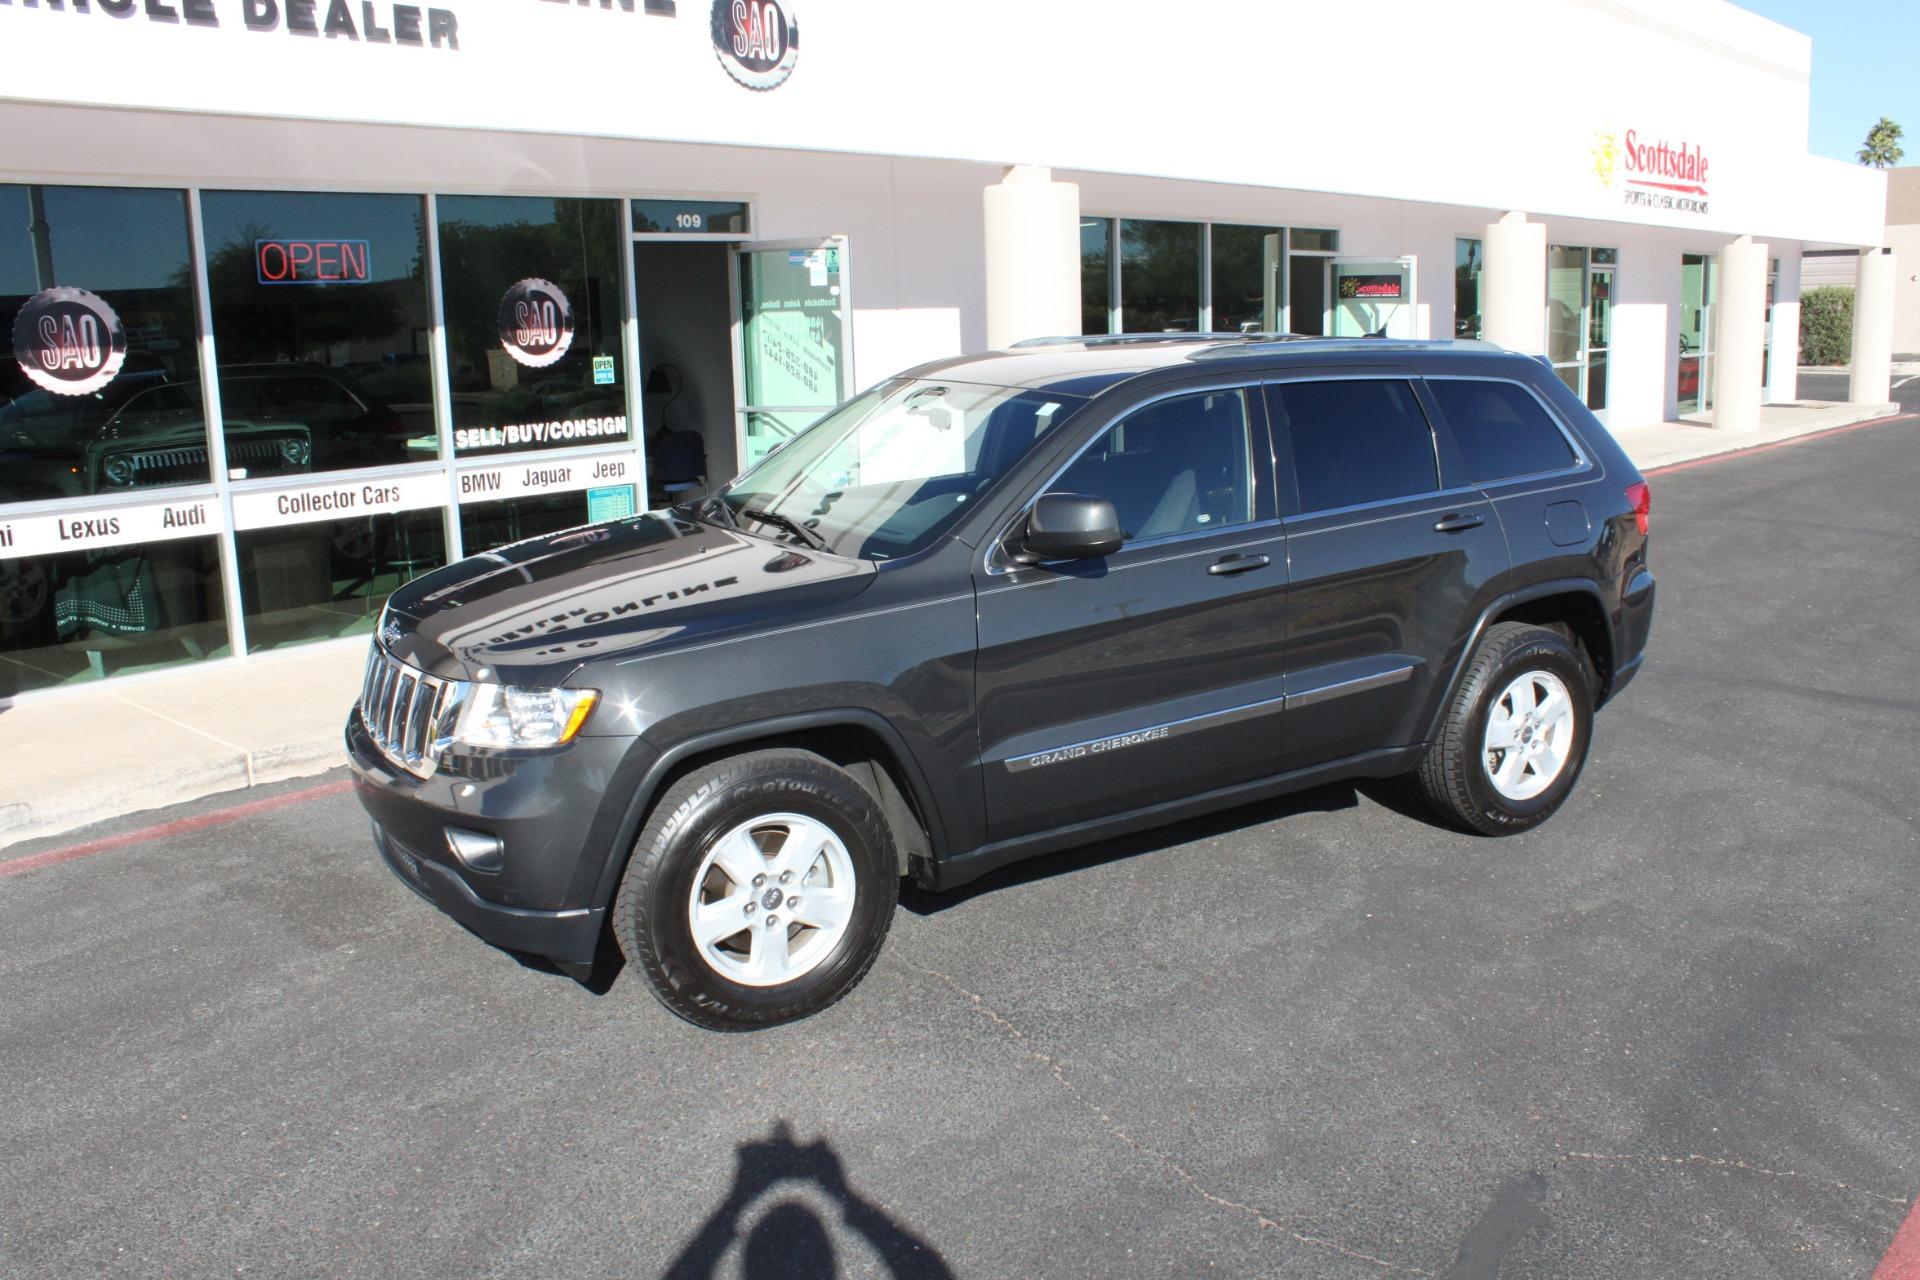 Used-2011-Jeep-Grand-Cherokee-Laredo-Acura